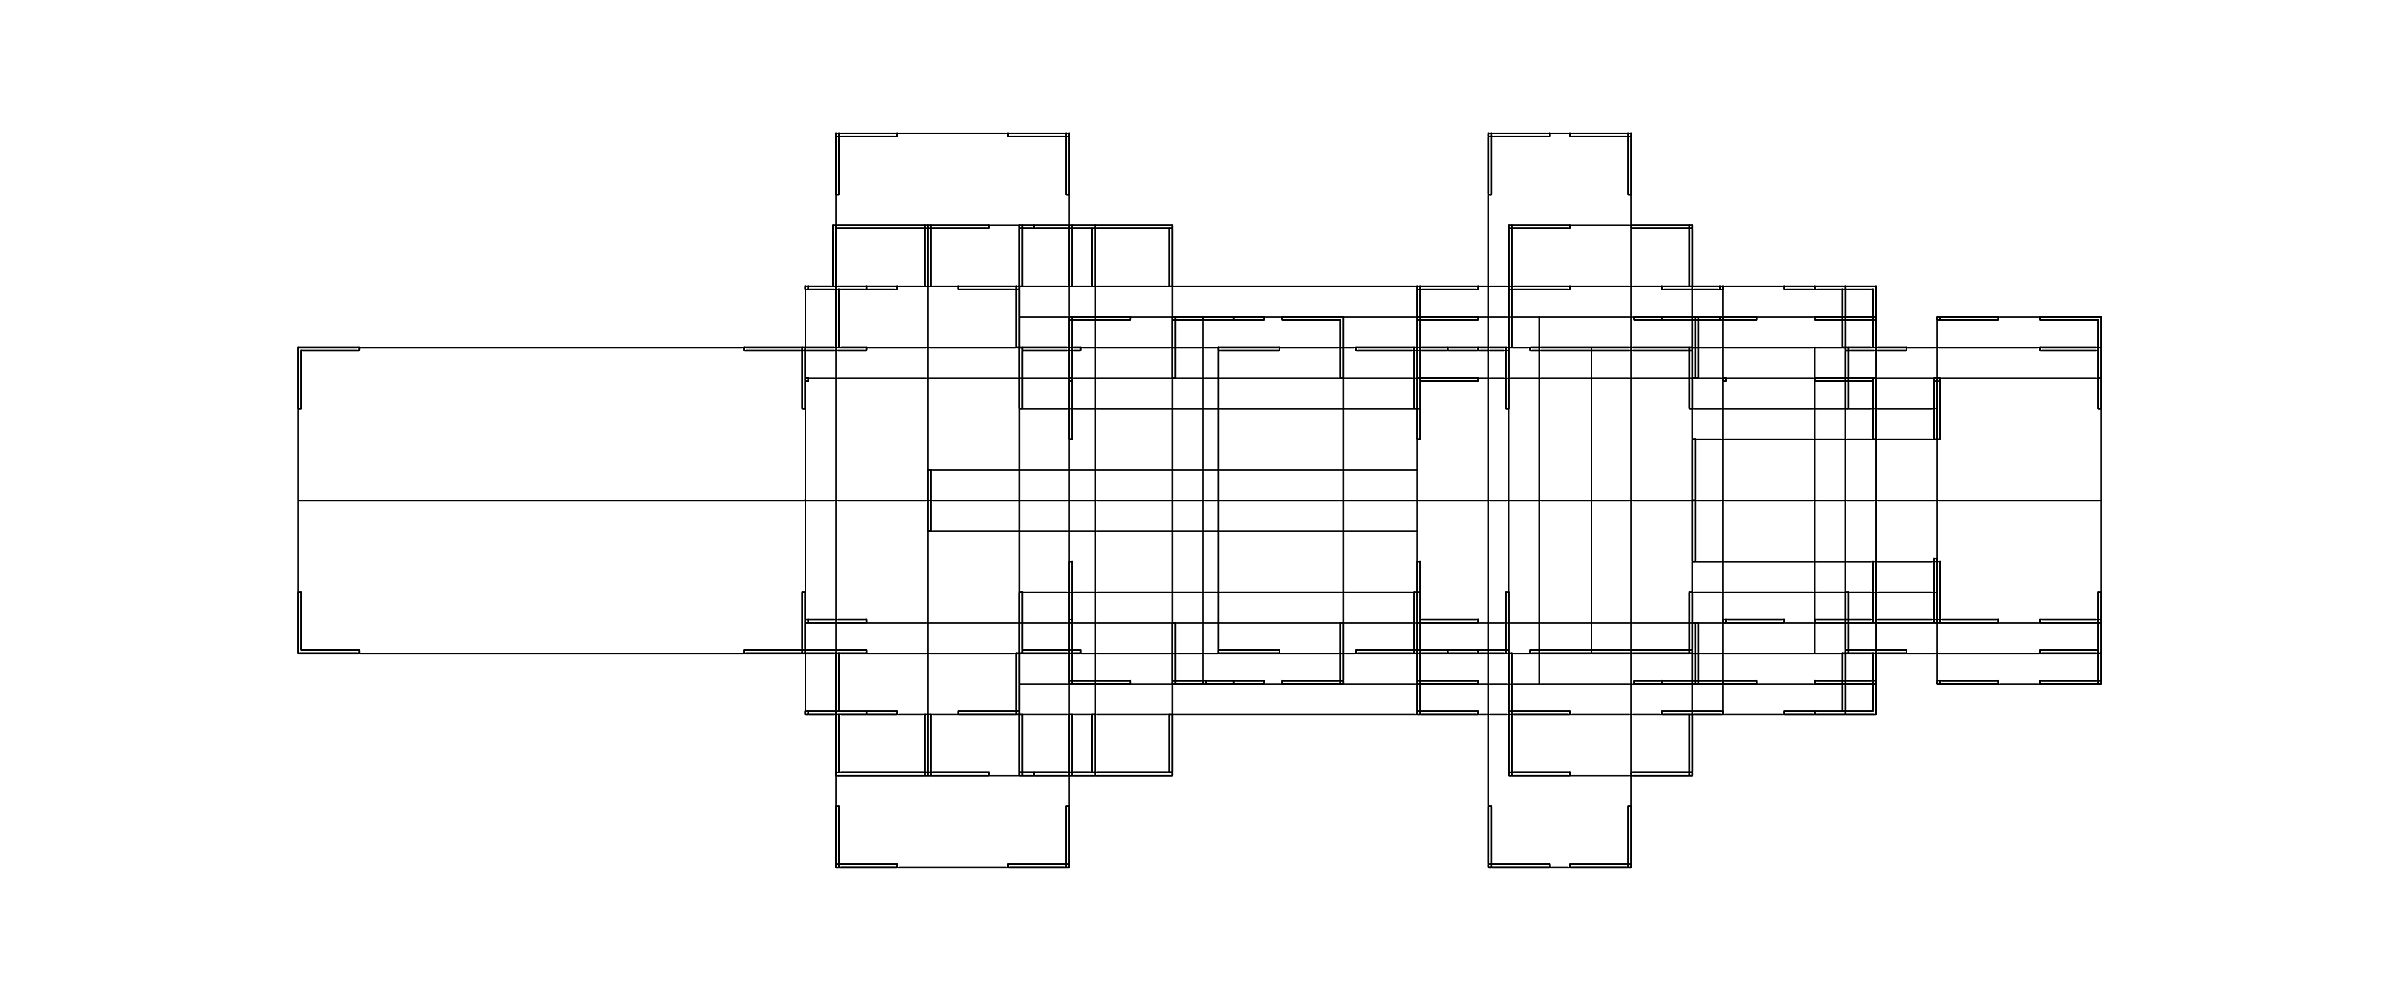 Mies Remix elevation